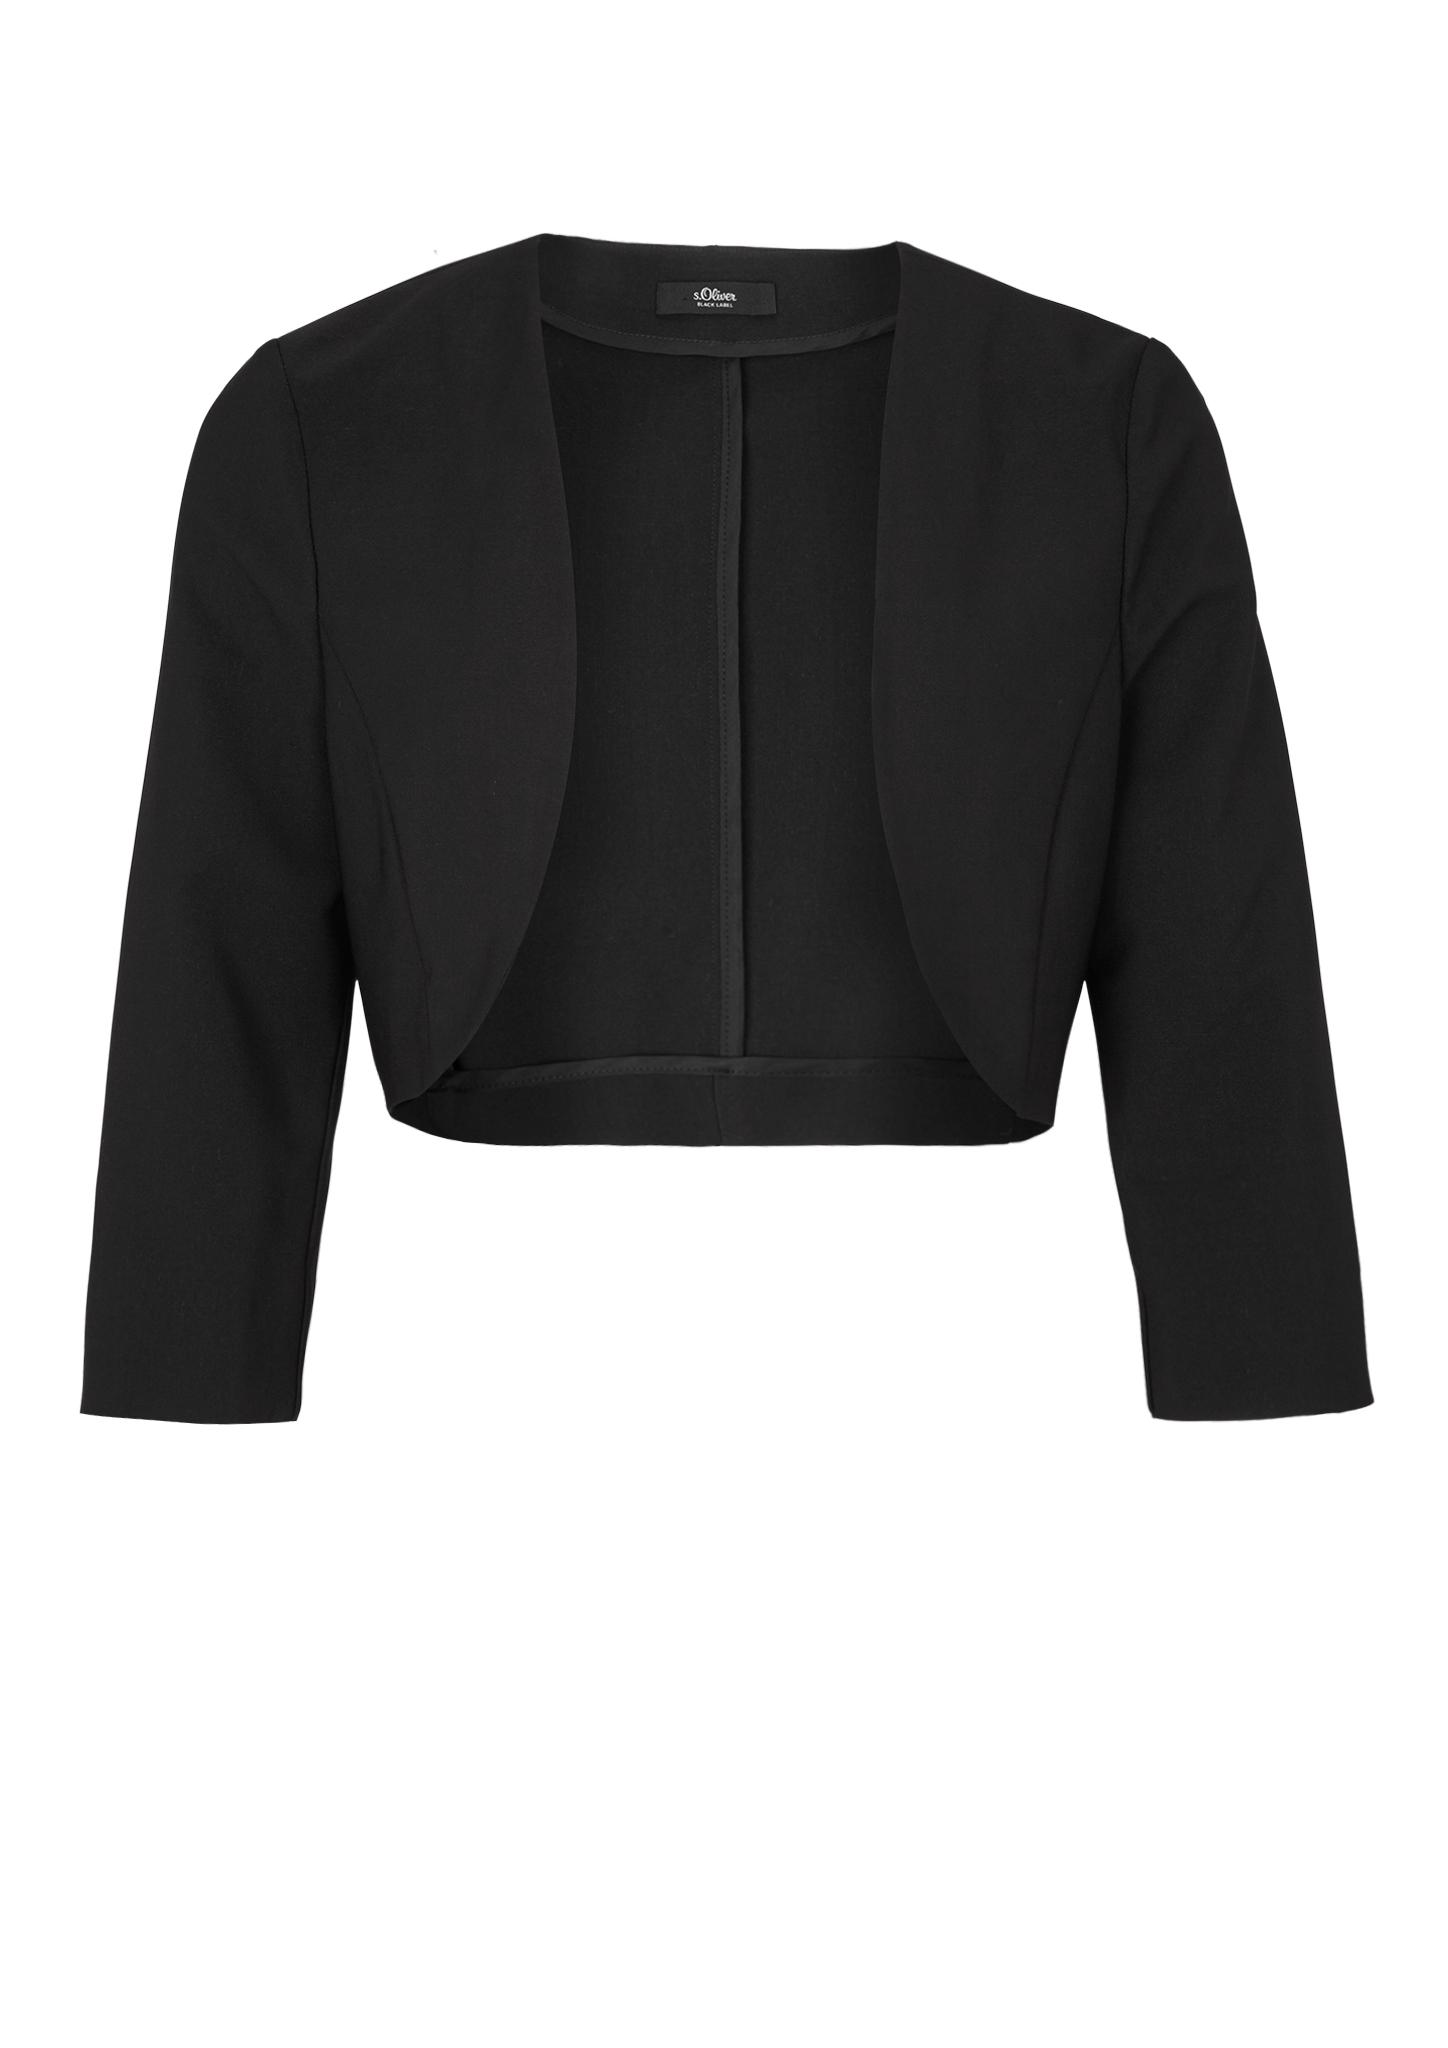 Bolero | Bekleidung > Jacken > Boleros | Grau/schwarz | Obermaterial 86% polyester -  14% elasthan| futter (paspelierung) 100% acetat | s.Oliver BLACK LABEL